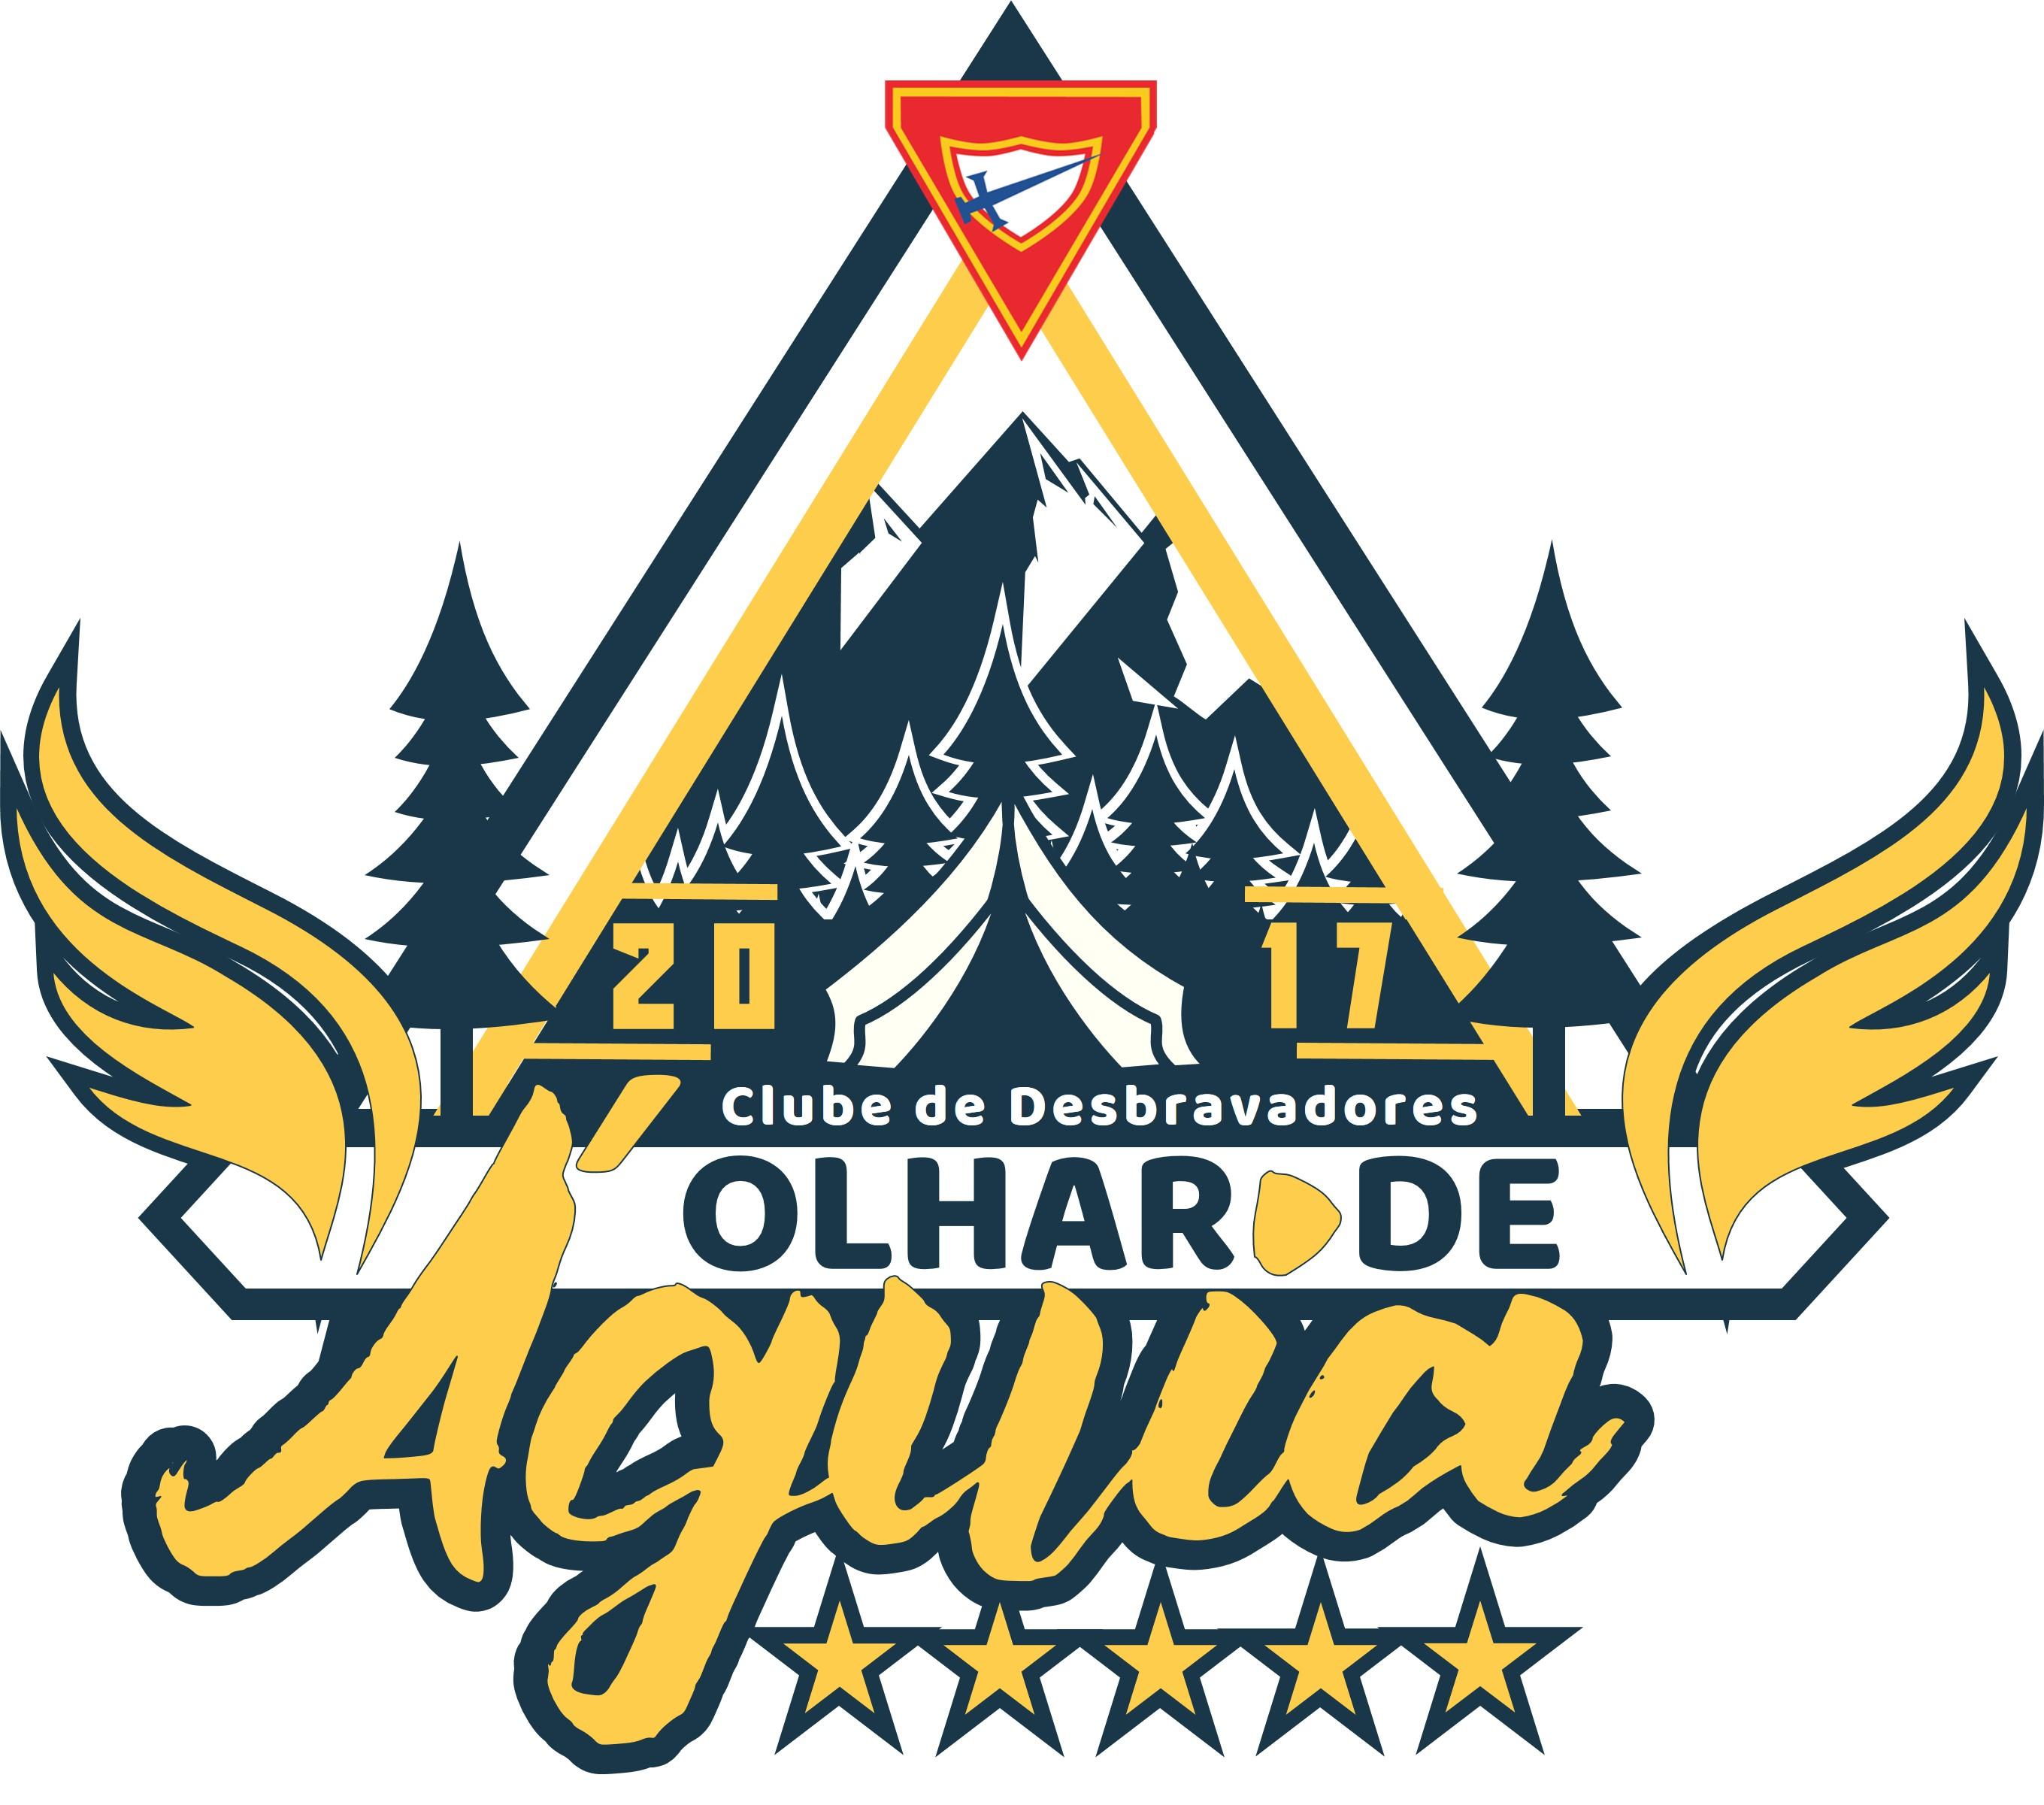 OLHAR DE ÁGUIA